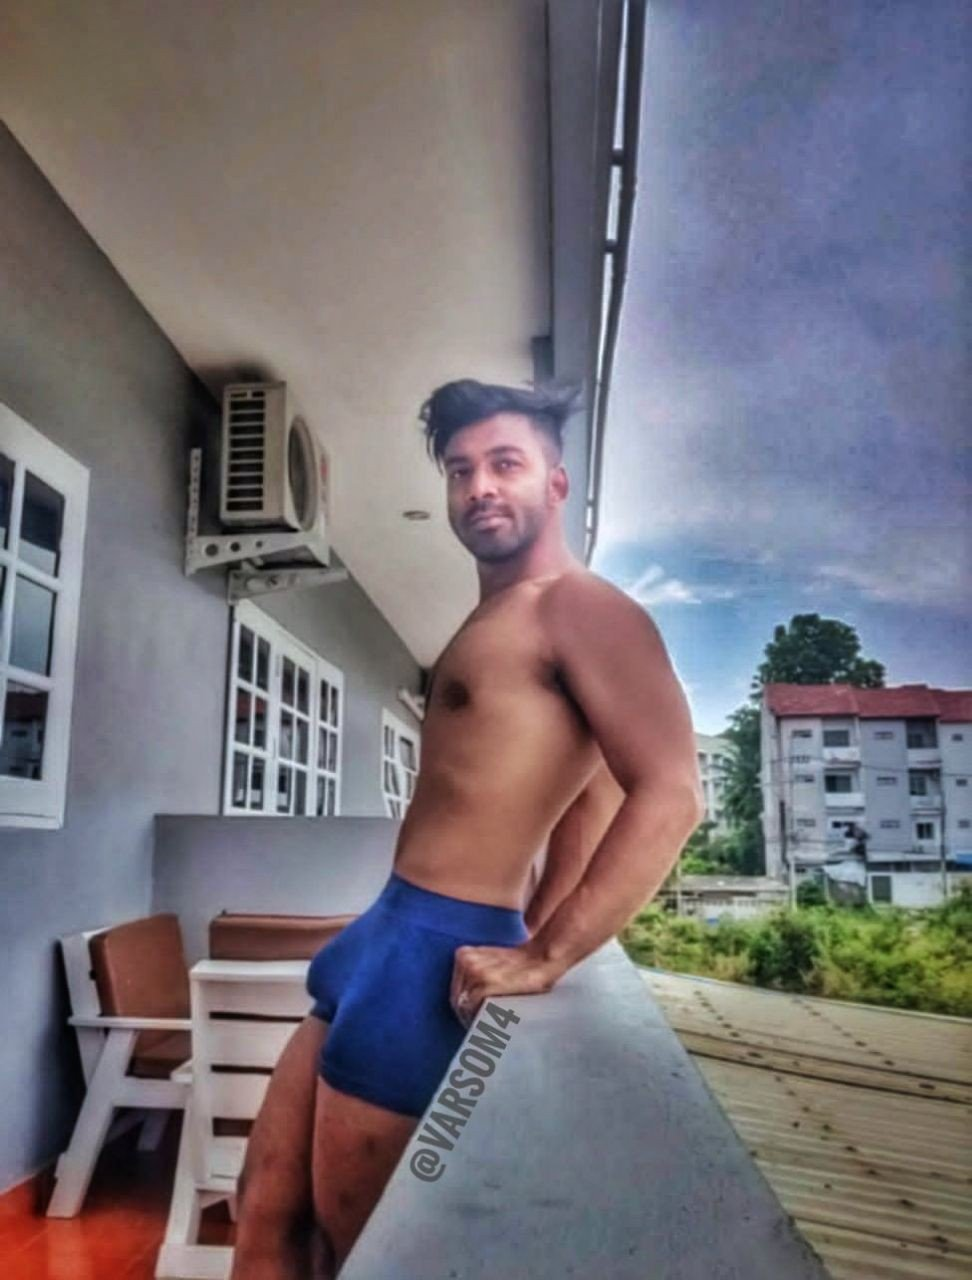 Bulging underwear pics of sexy Indian hunk with boner